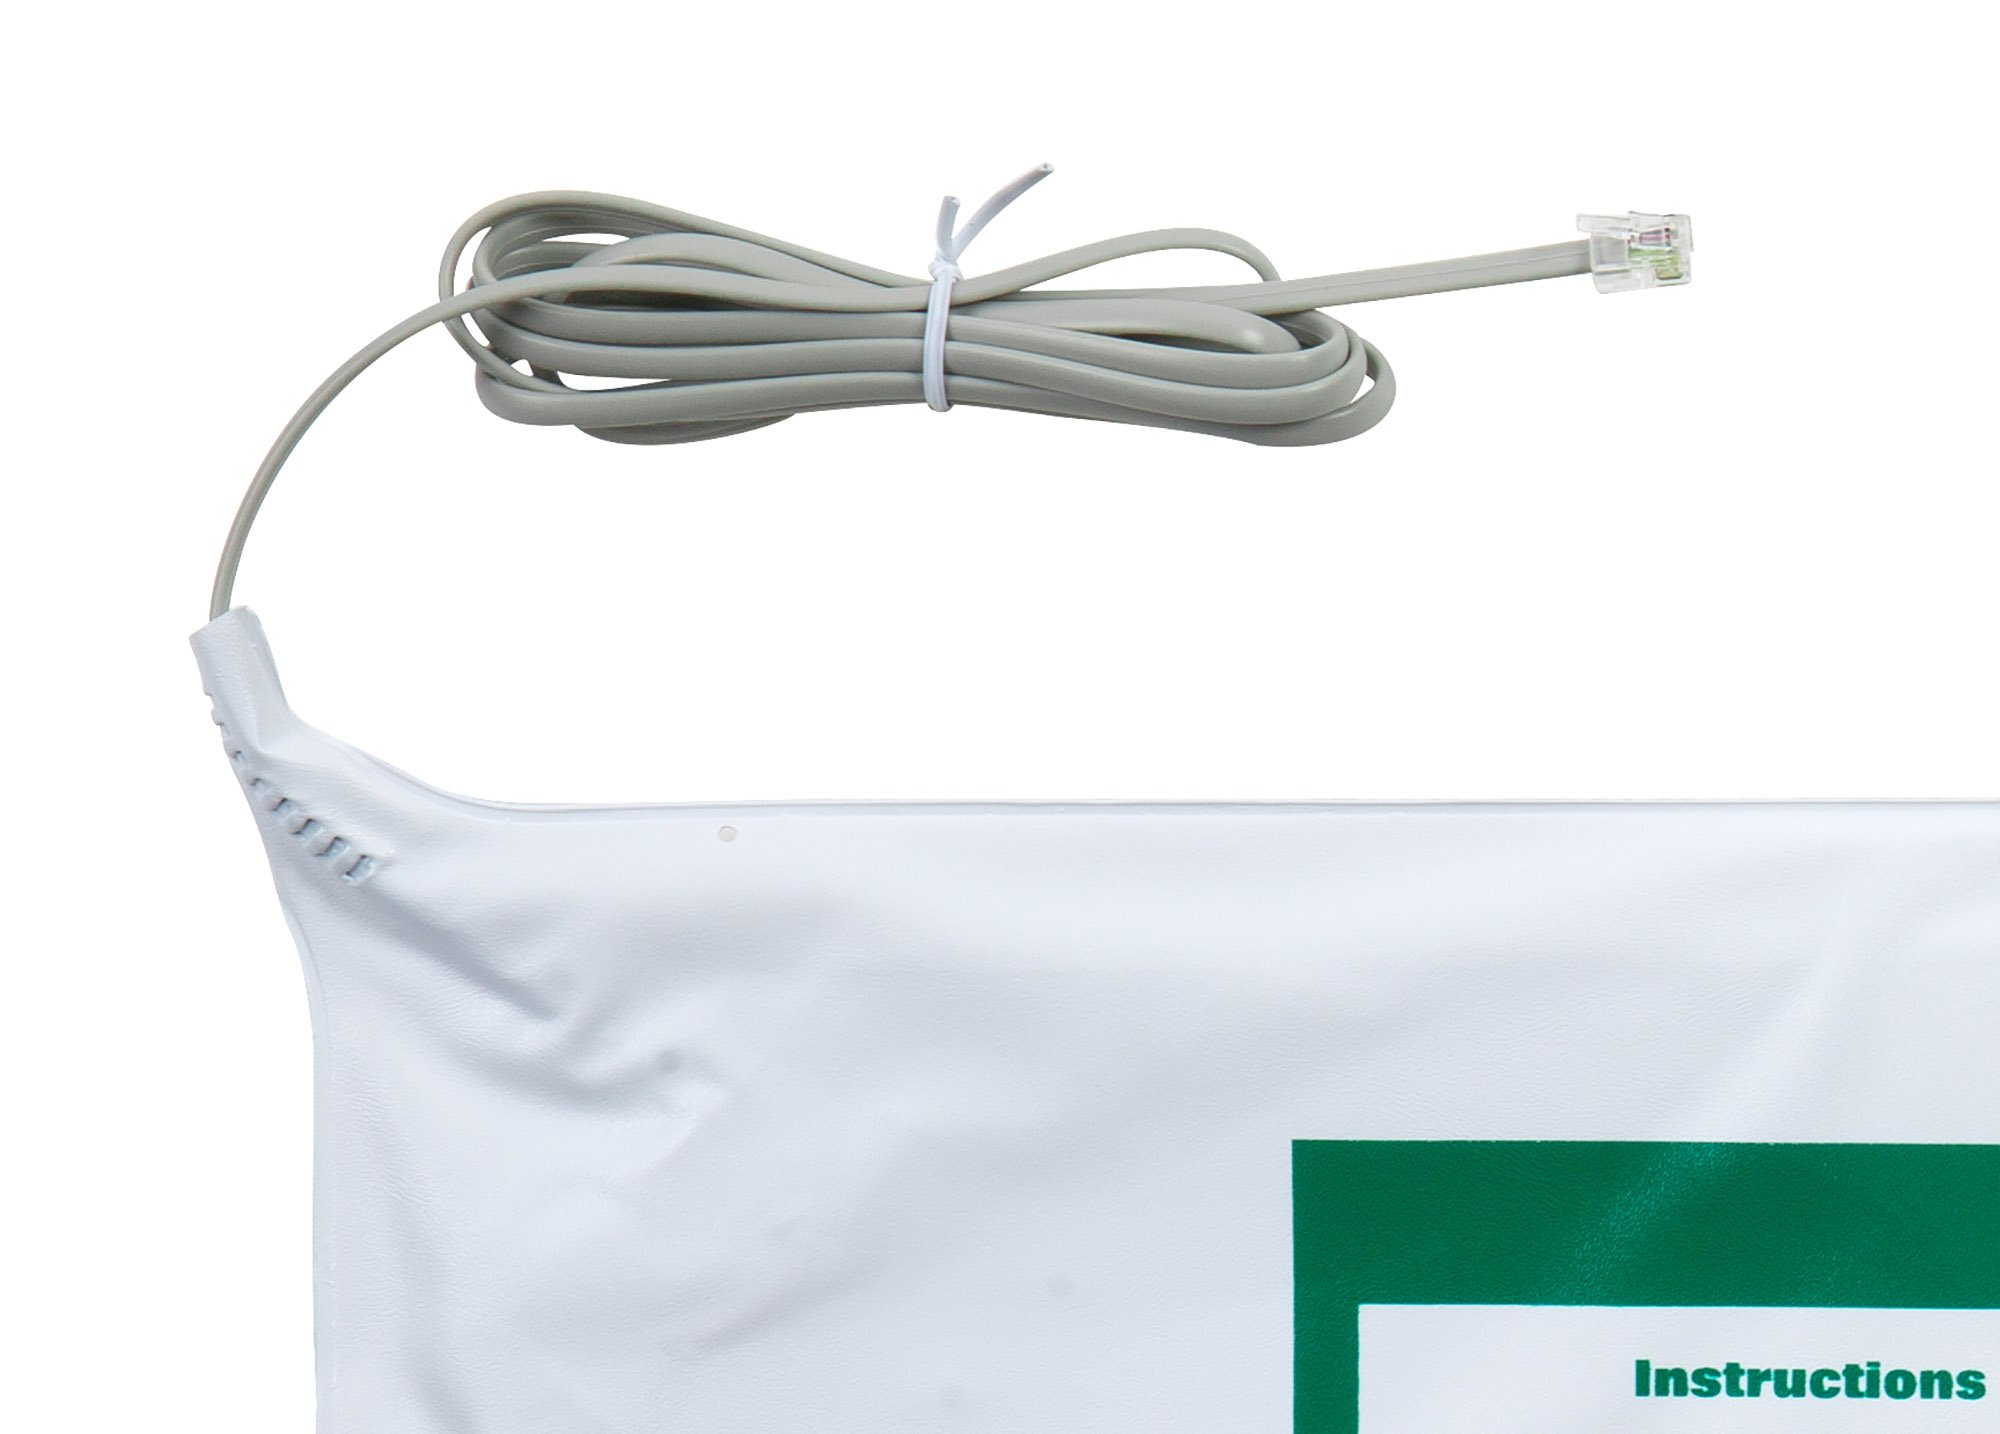 Arrowhead Healthcare Supply P-107506 Universal 90-Day Bed Sensor Pad, Light Grey